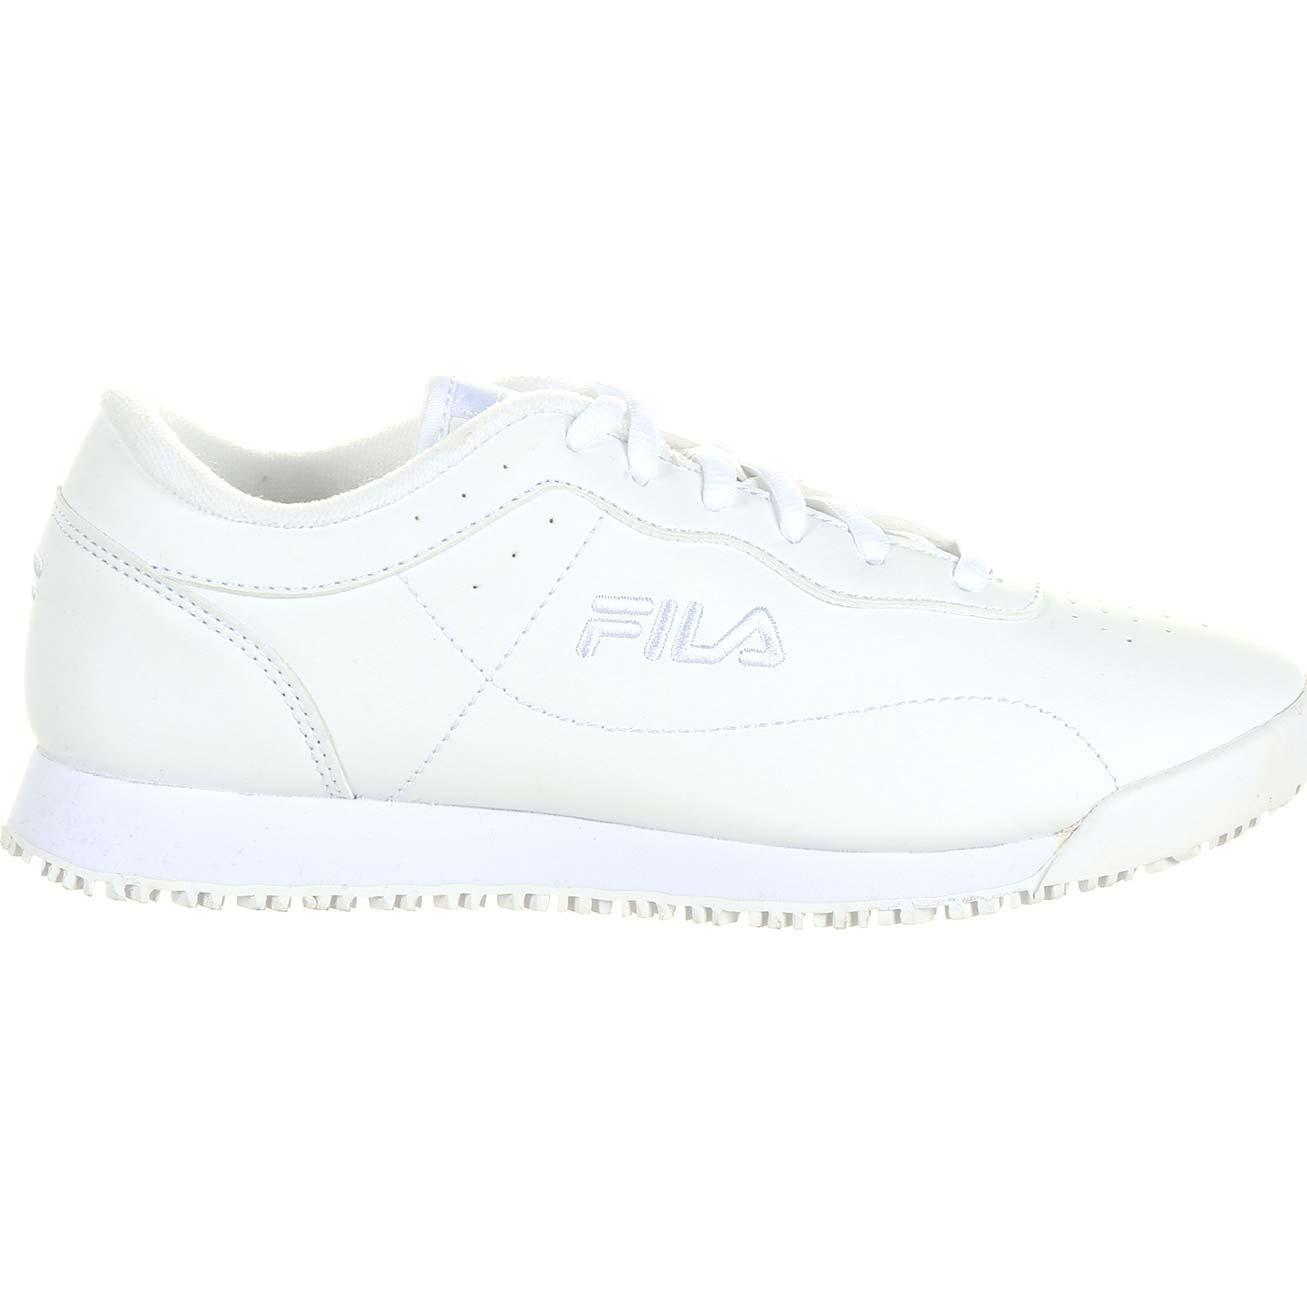 783eb46fac Fila Memory Viable Women's Slip-Resistant Work Athletic Shoe